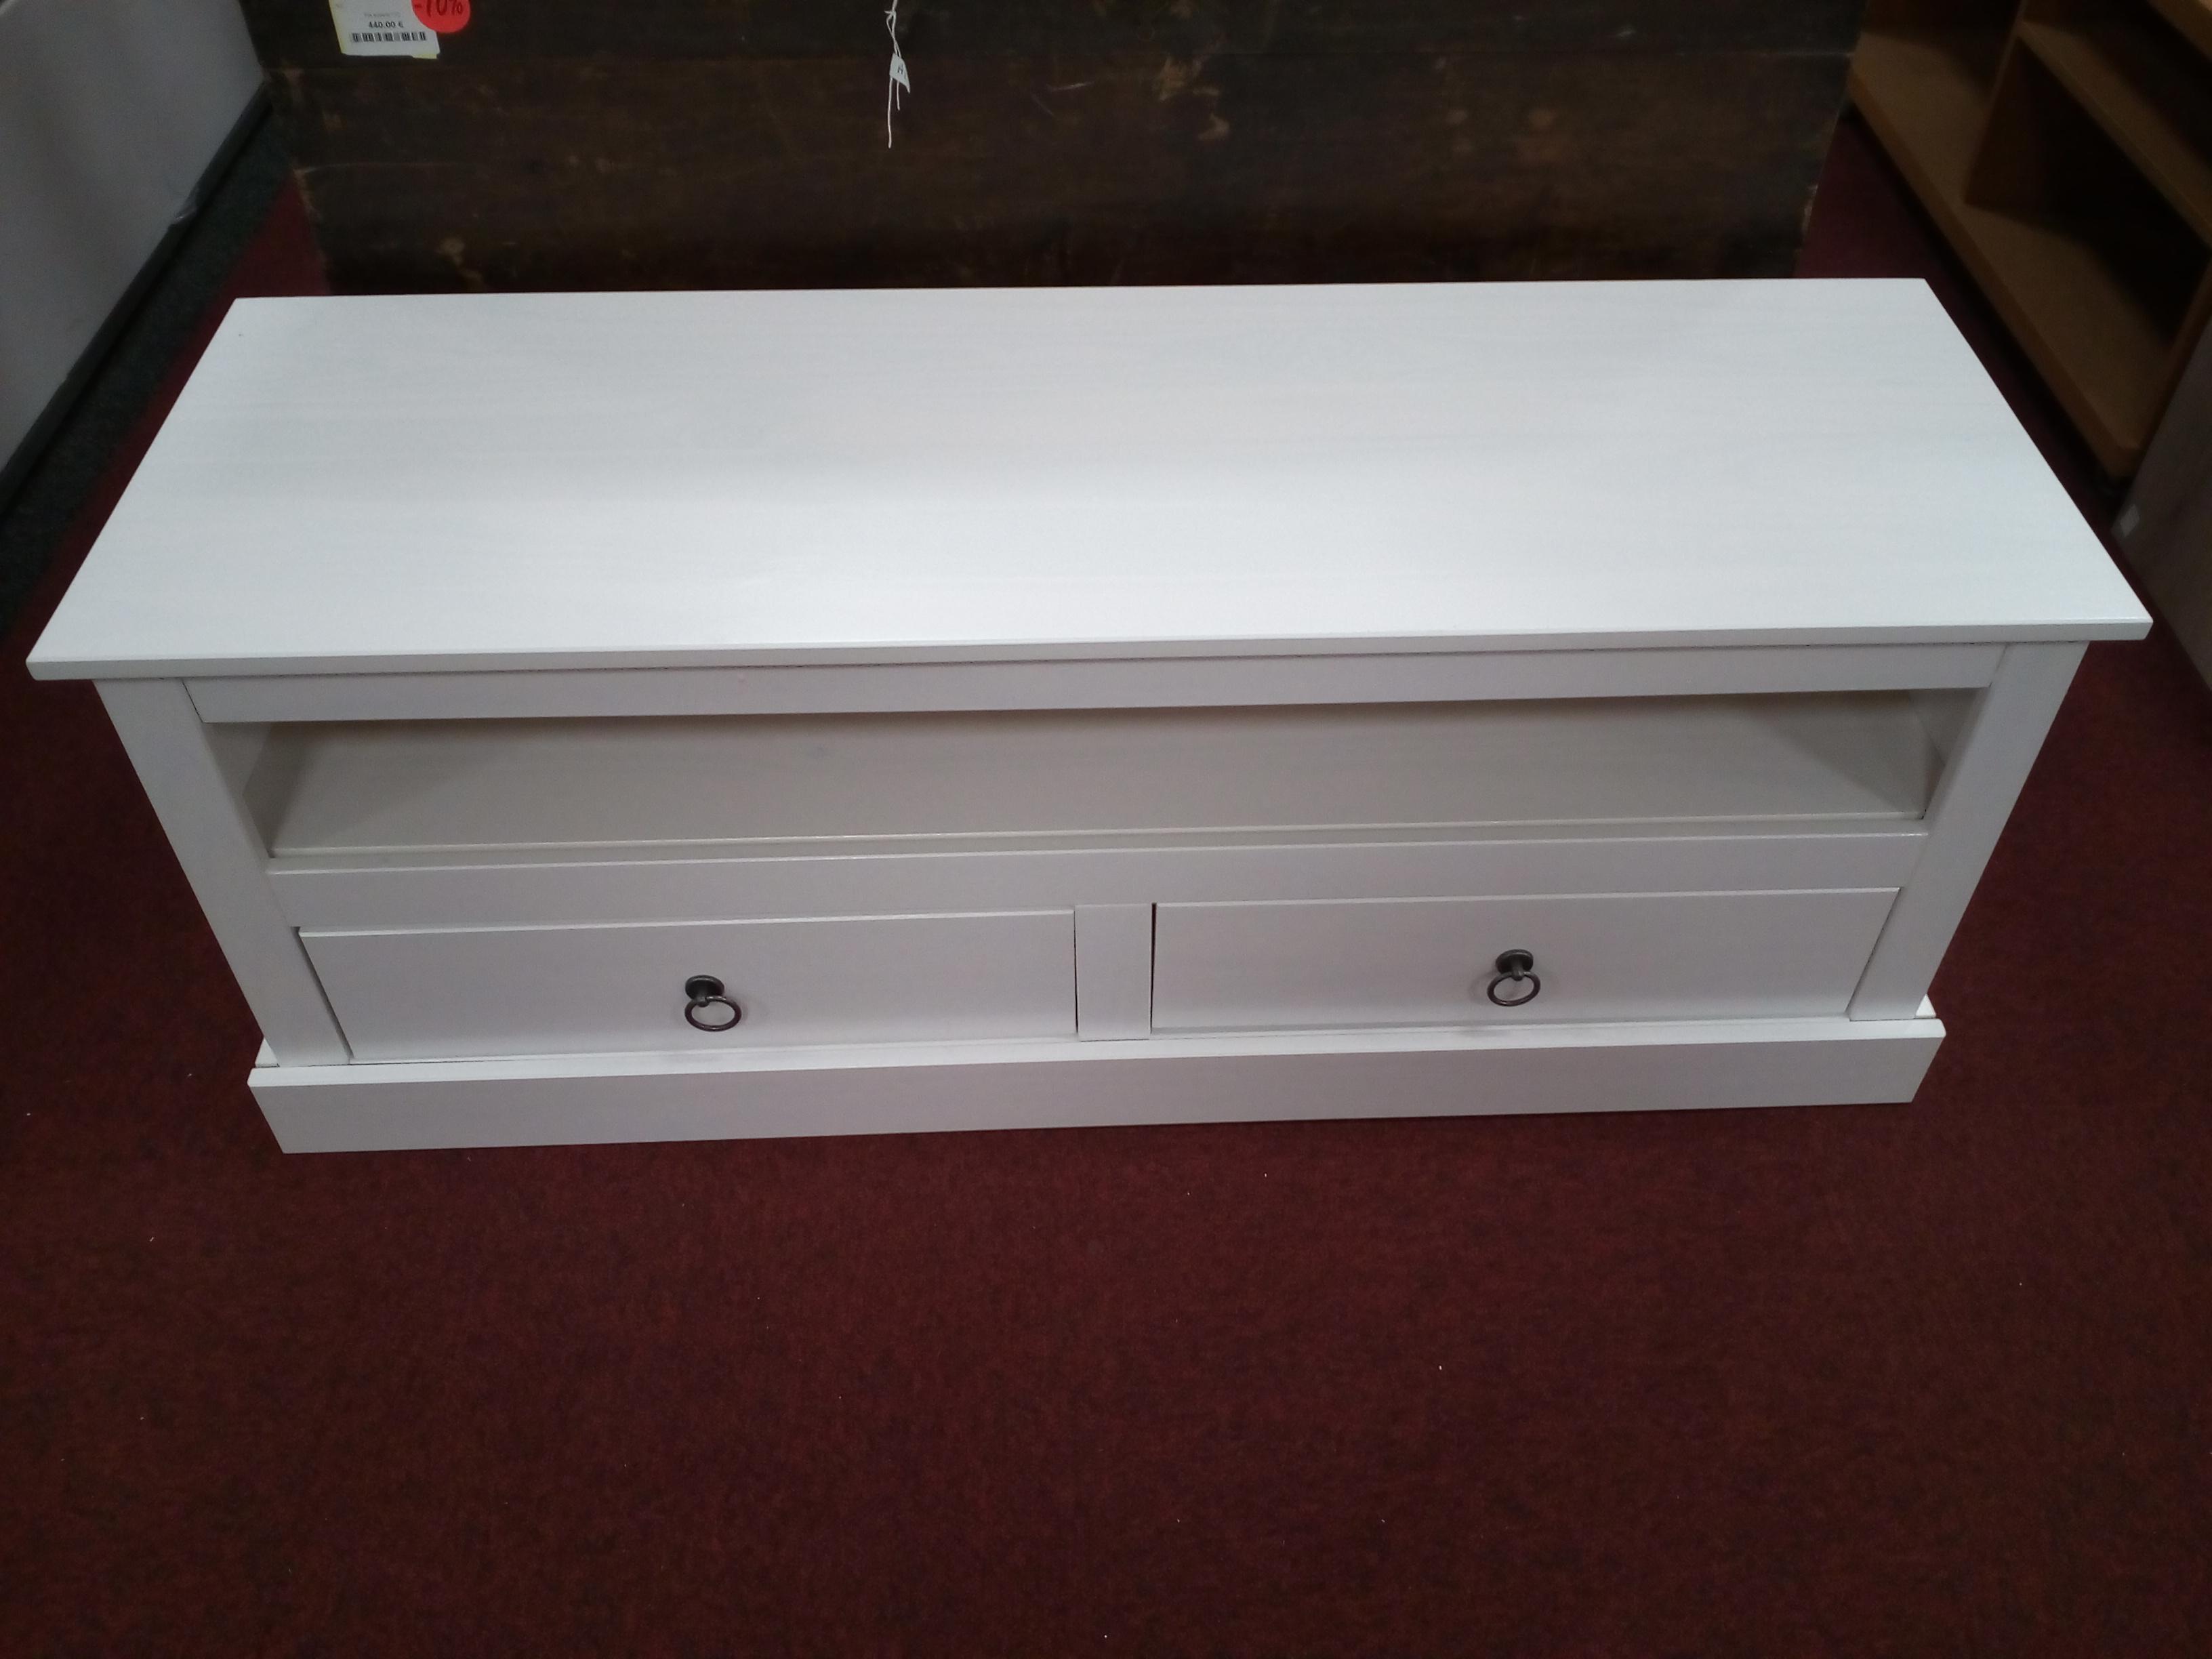 meuble tv blanc provence occasion la cabane du troc. Black Bedroom Furniture Sets. Home Design Ideas